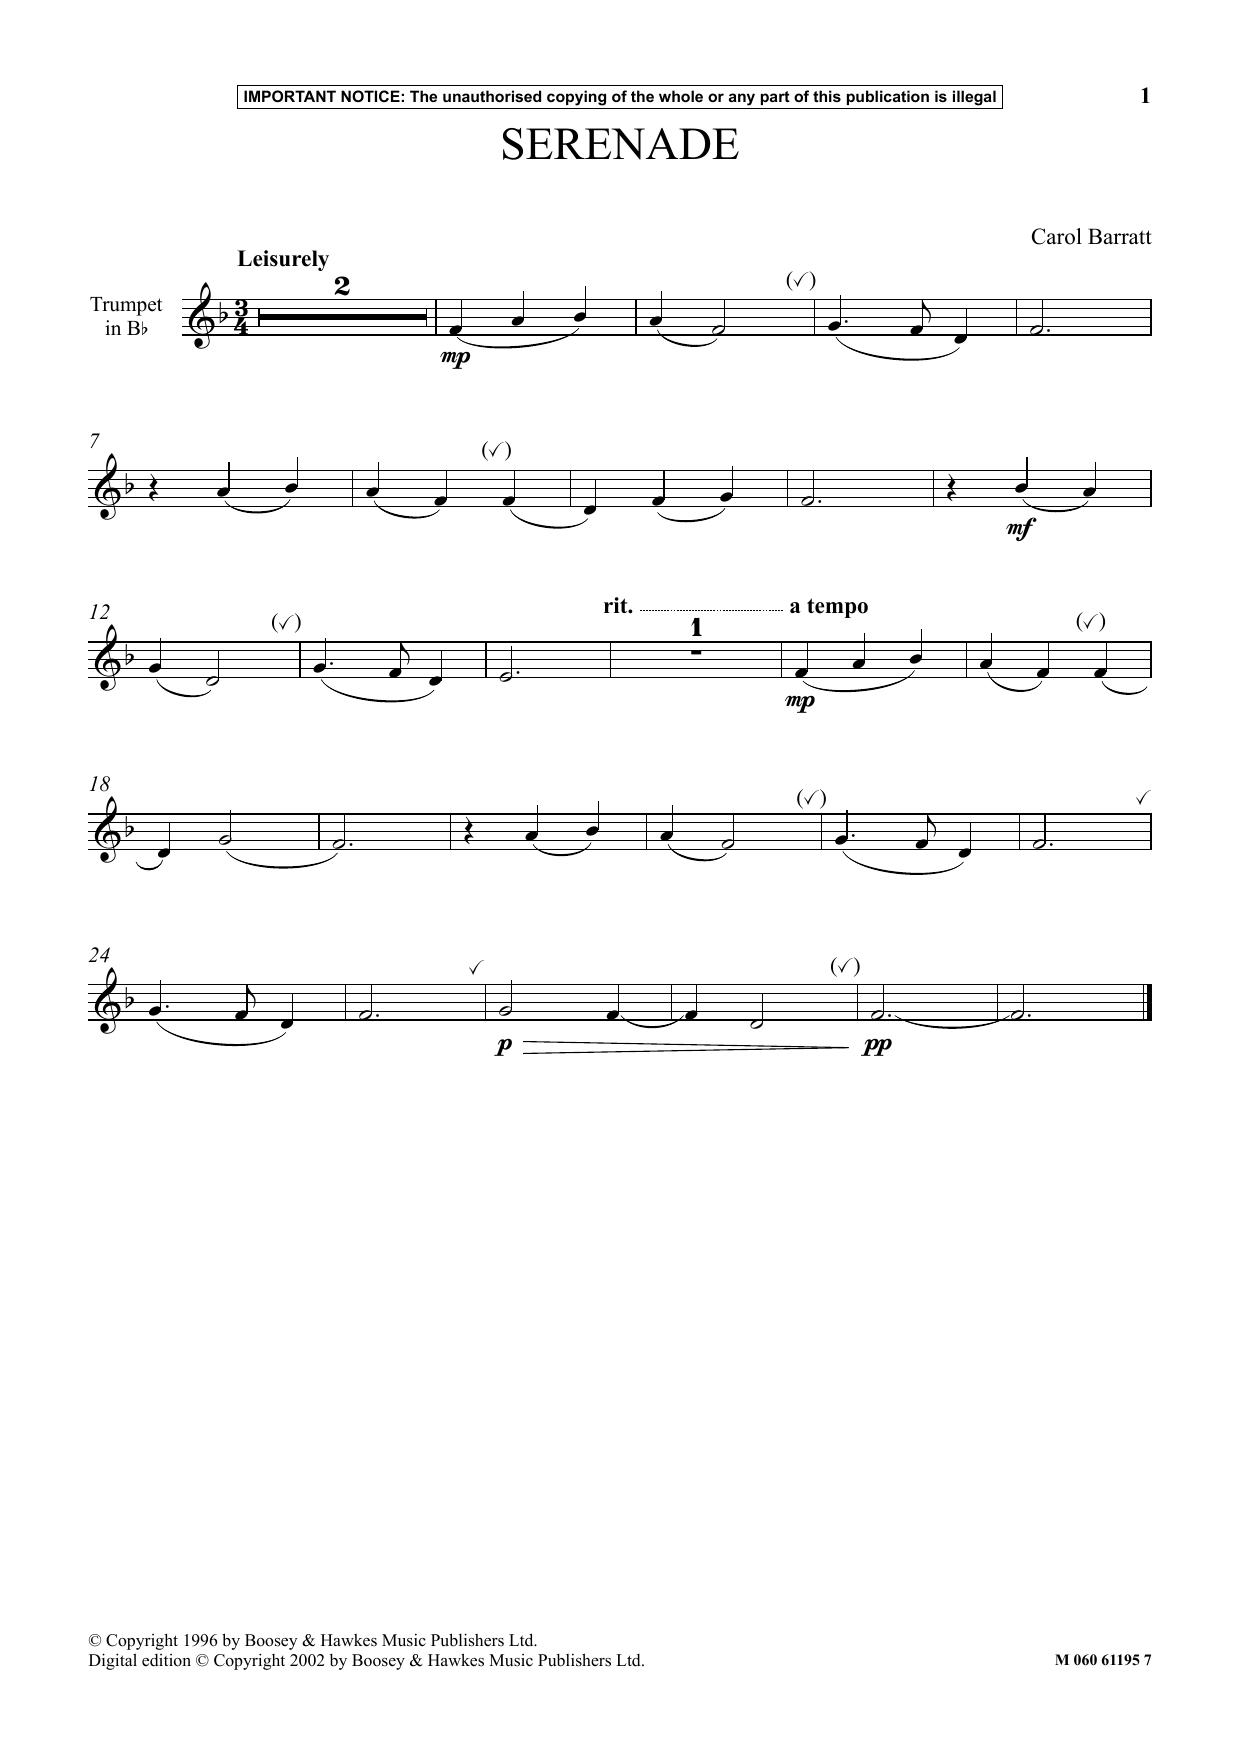 Carol Barratt Serenade sheet music notes and chords. Download Printable PDF.